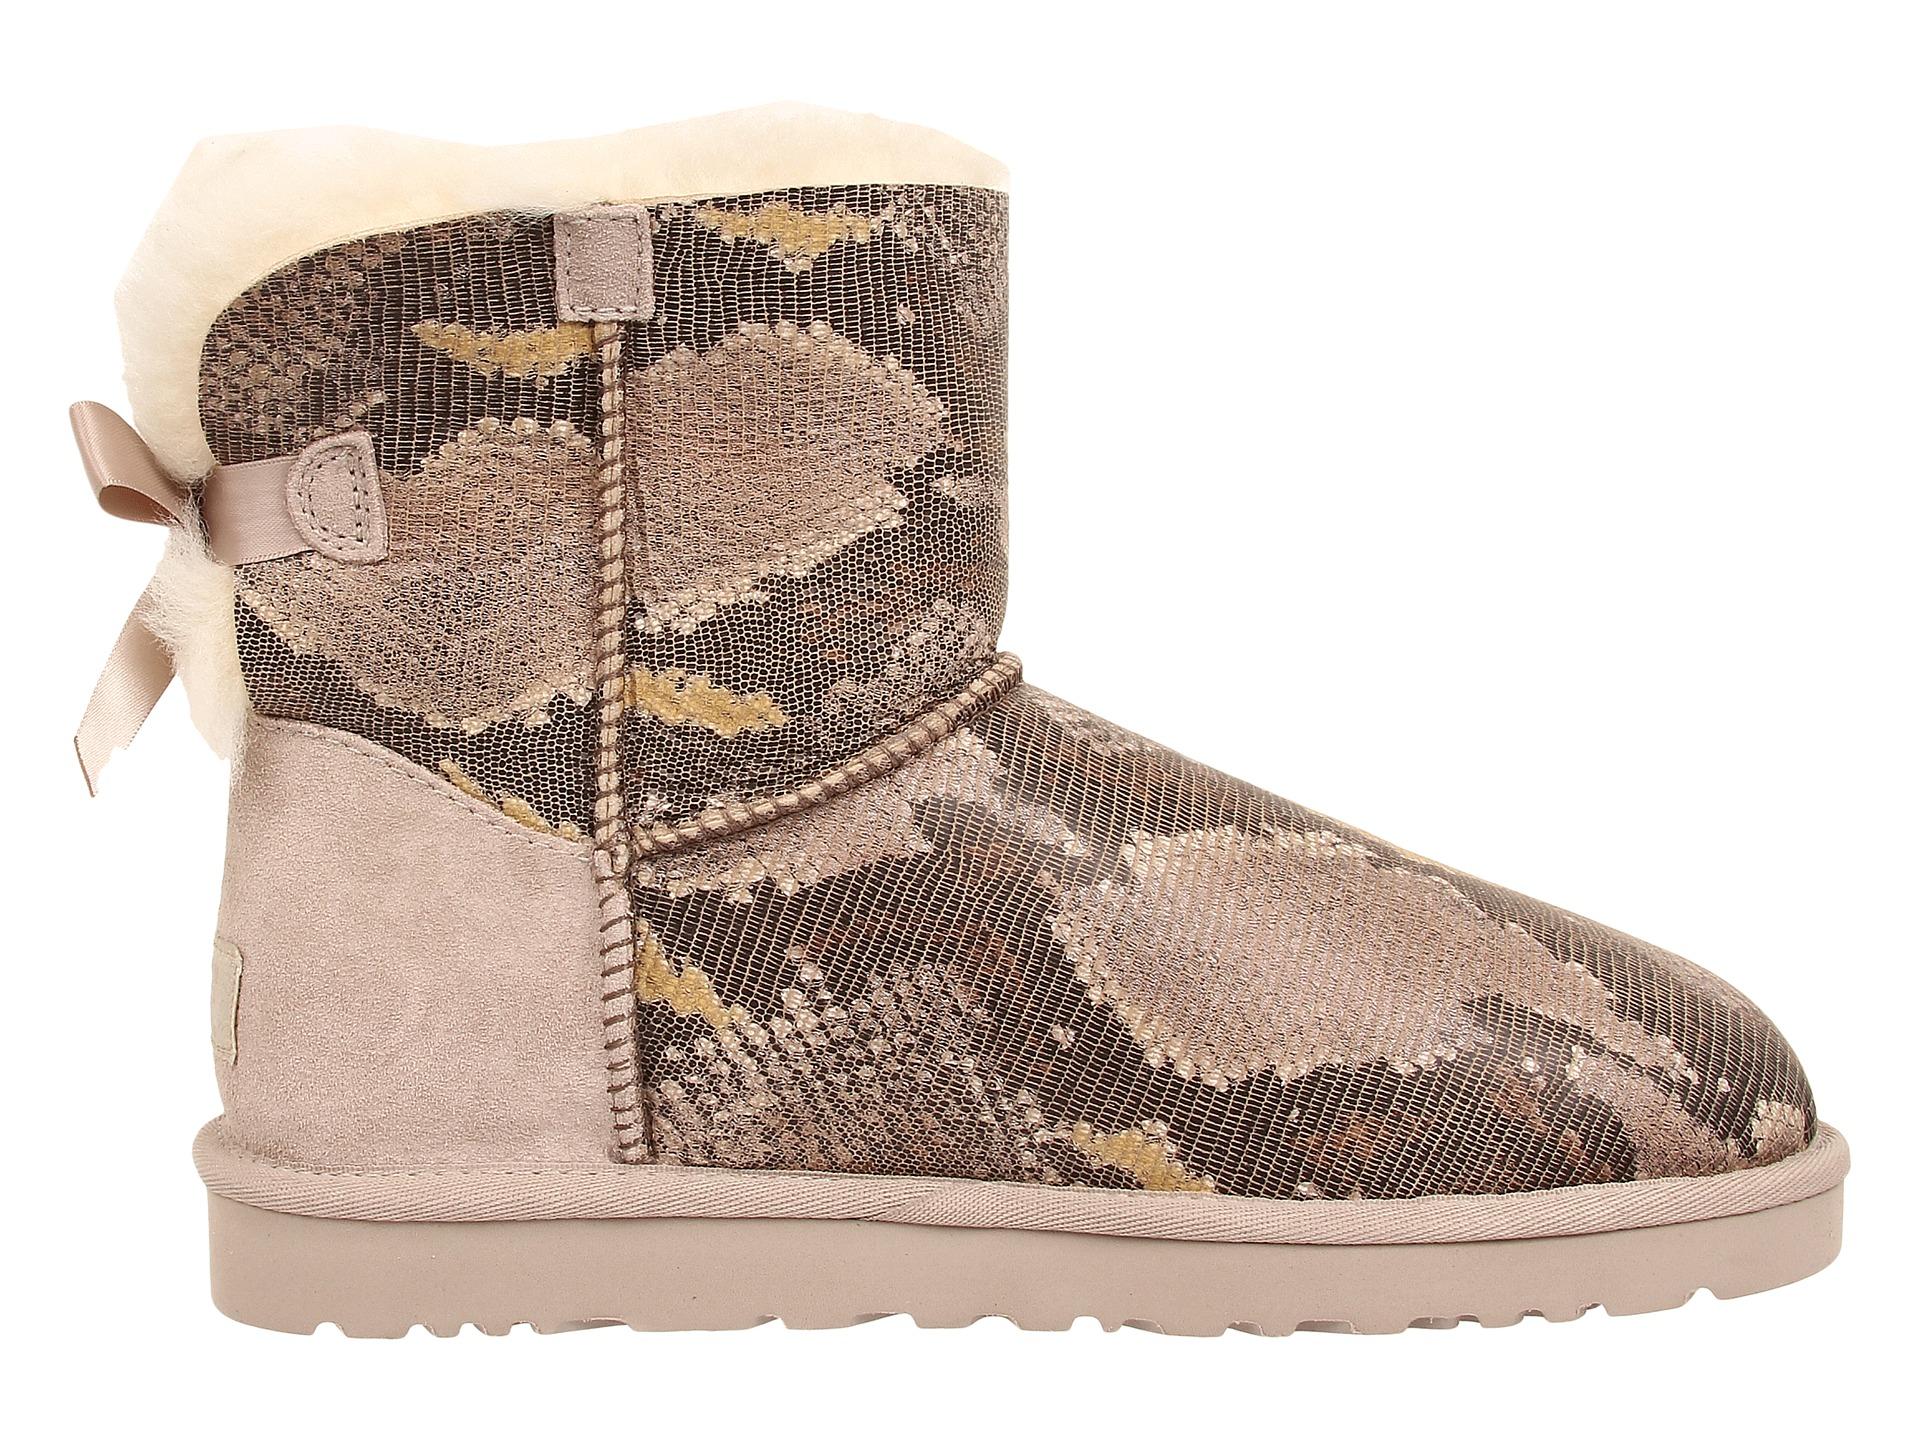 ugg mini bailey bow snake womens boots cheap watches mgc gas com rh mgc gas com